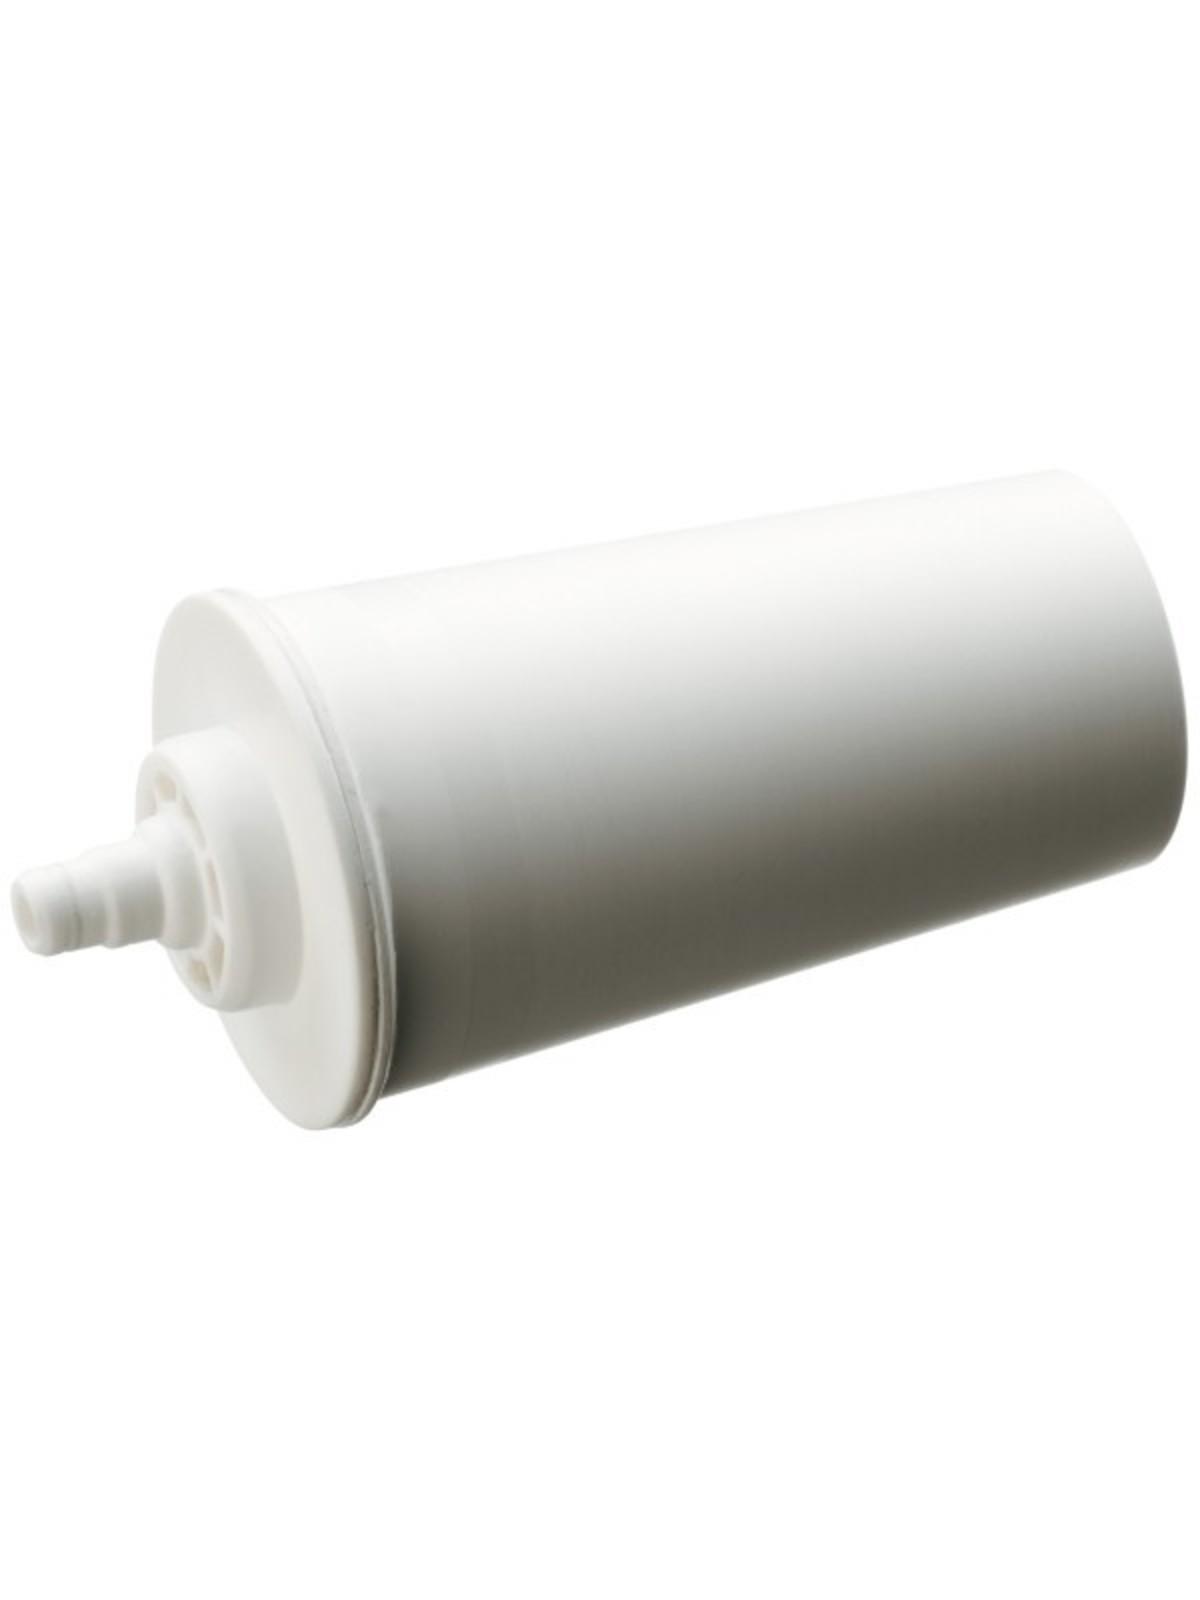 WMF Waterfilter 100